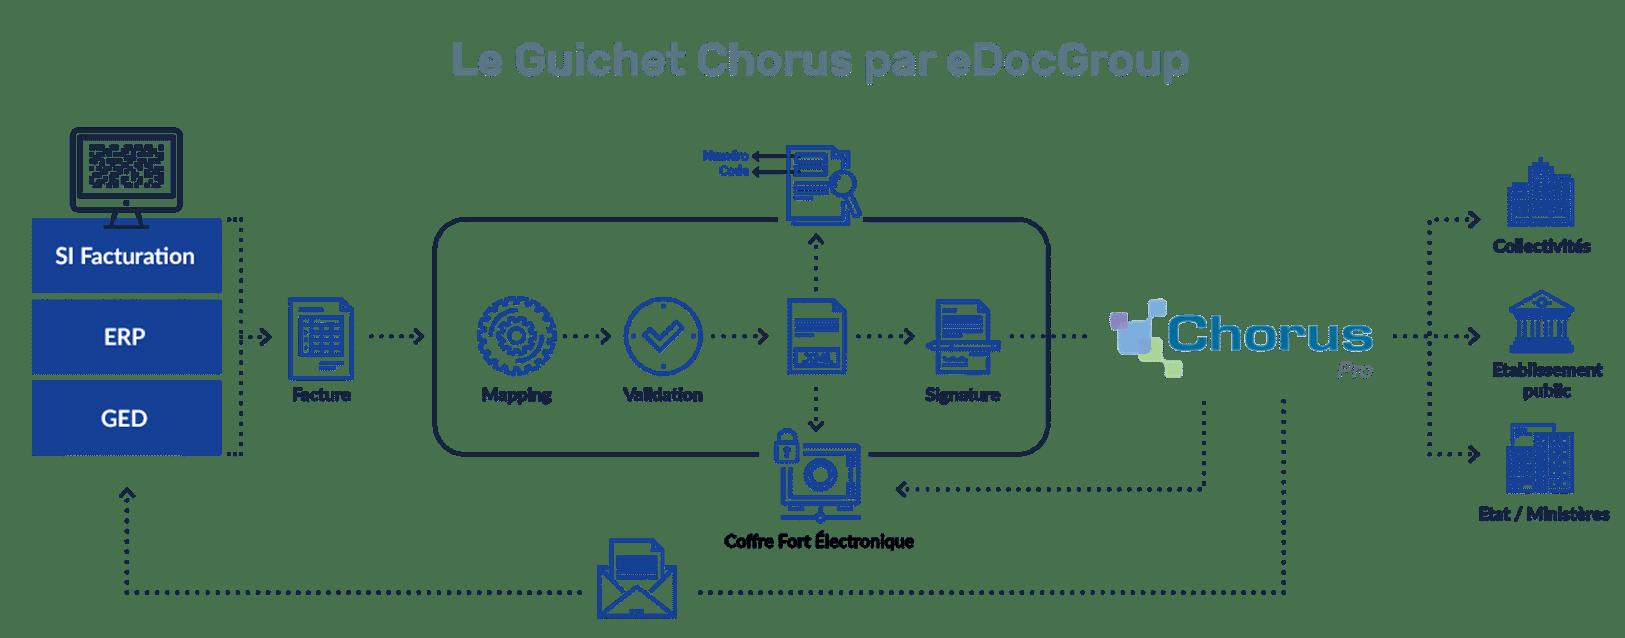 Guichet chorus